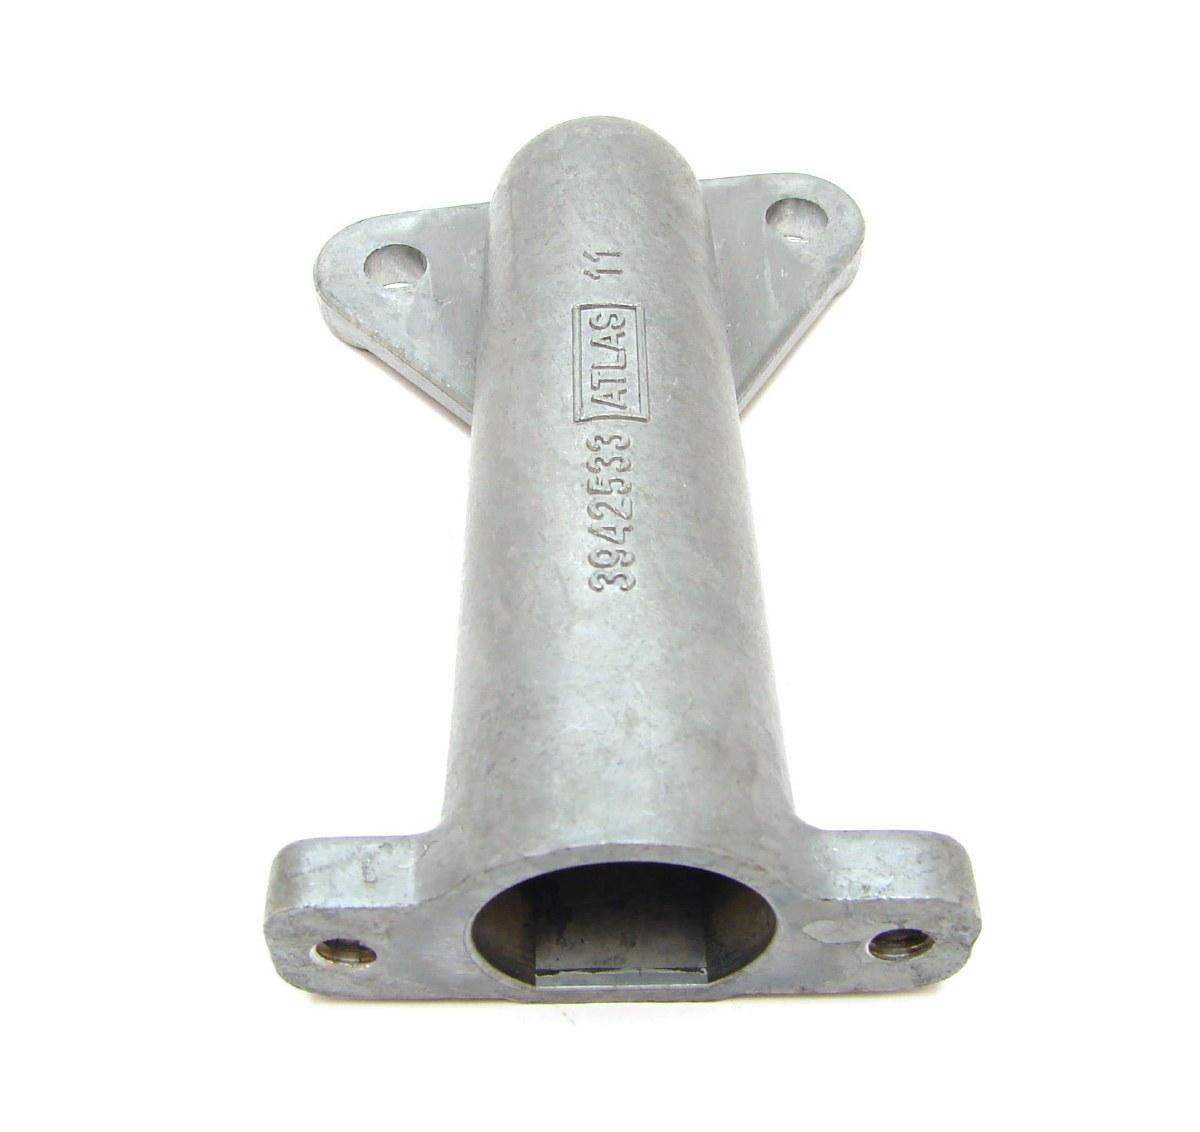 Diverter Valve Extension elbow Chevelle Camaro 302 350 396 427 Atlas 69 70 71